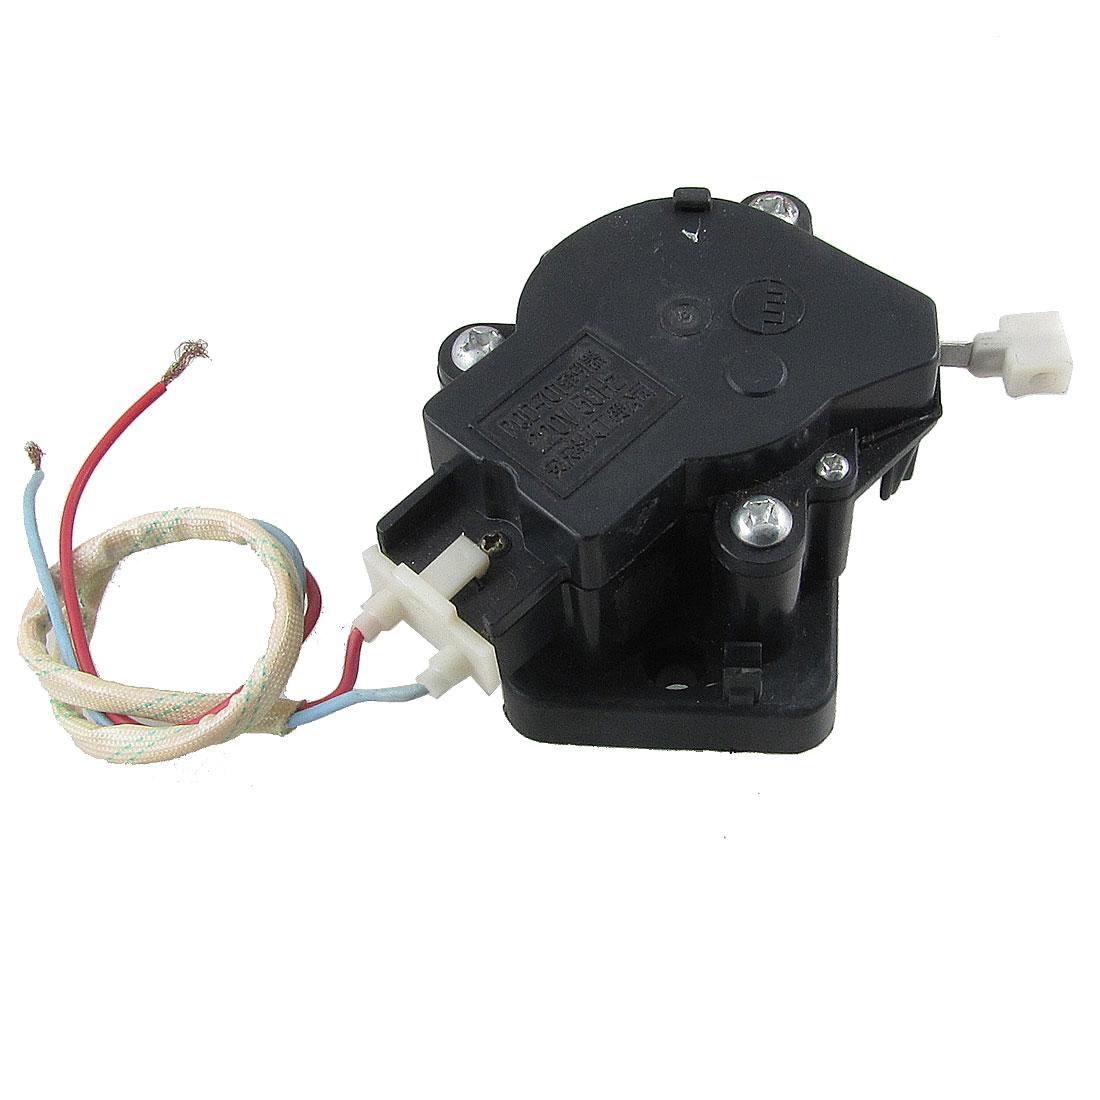 Washing Machine Washer Component Black Drain Motor Tractor AC 220V 50Hz